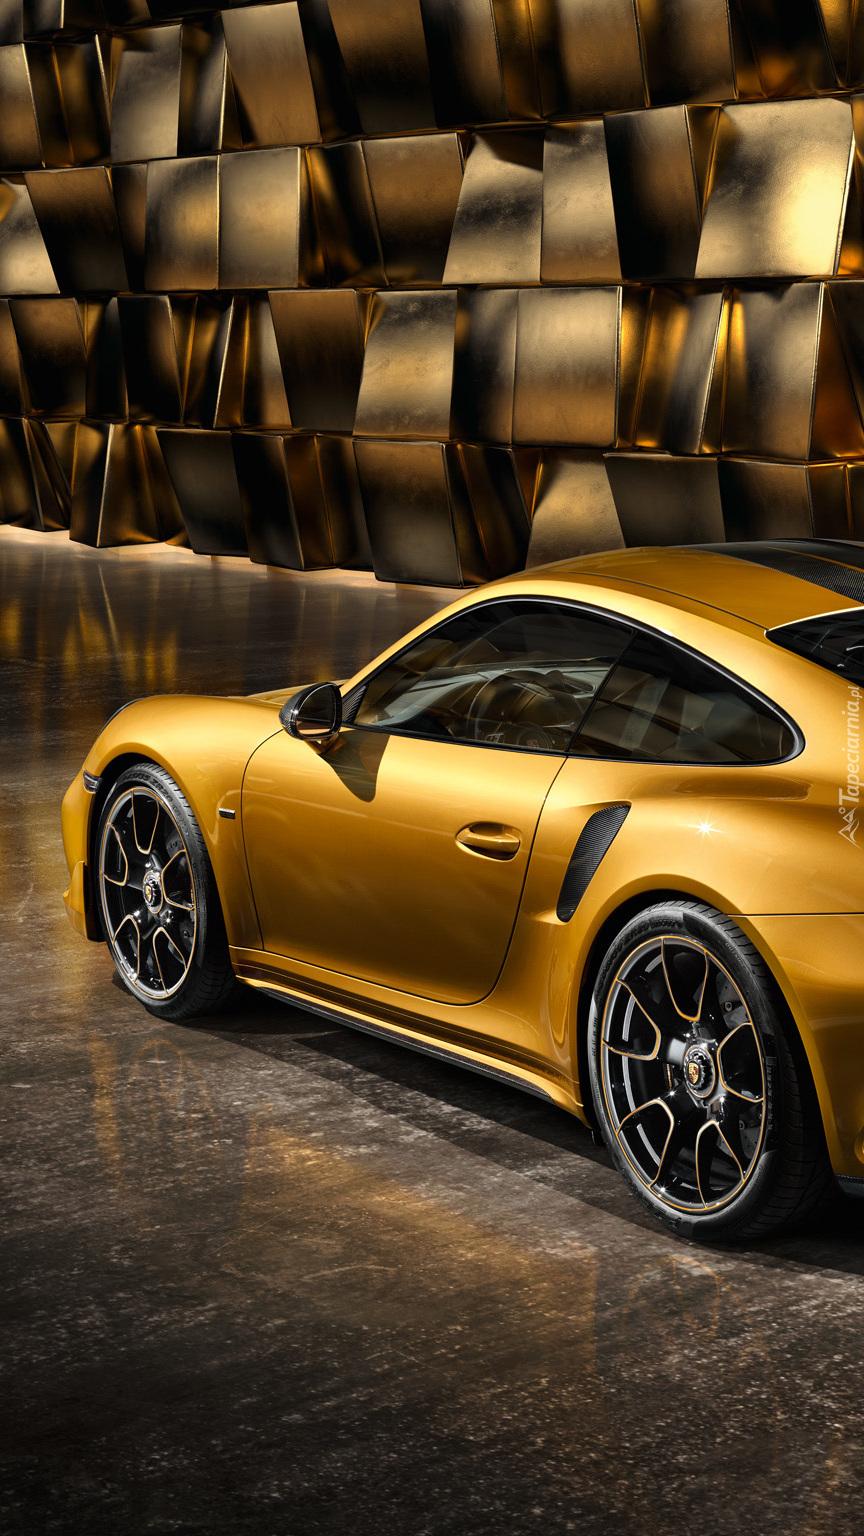 Bok Porsche 911 Turbo S Exclusive Series